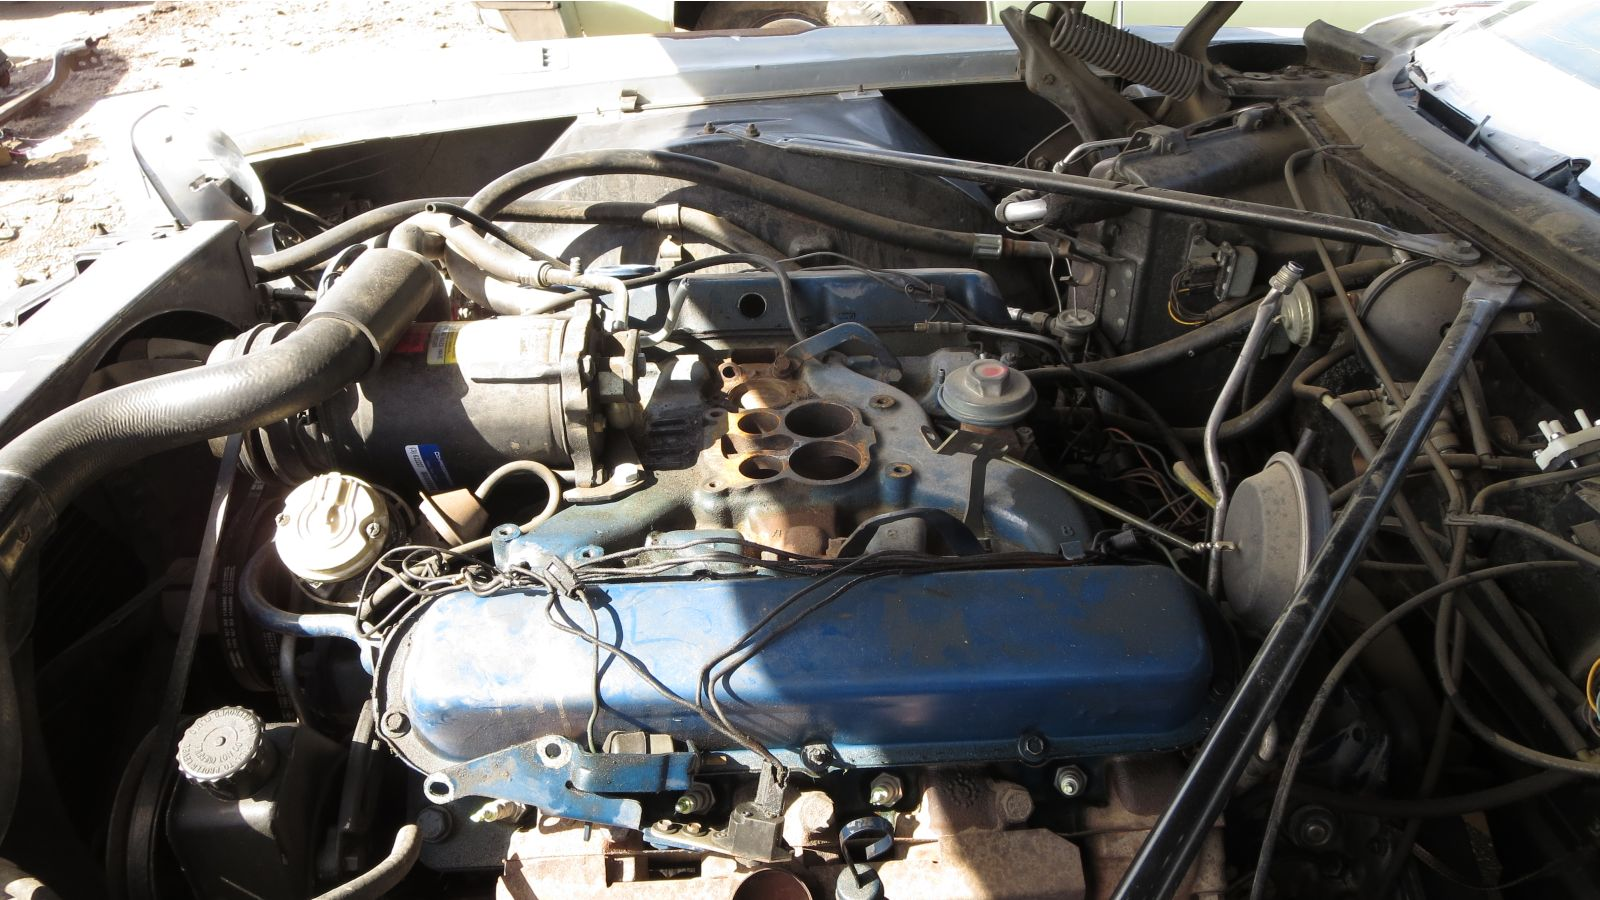 Cadillac 500-cubic-inch V8 engine in 1973 Eldorado